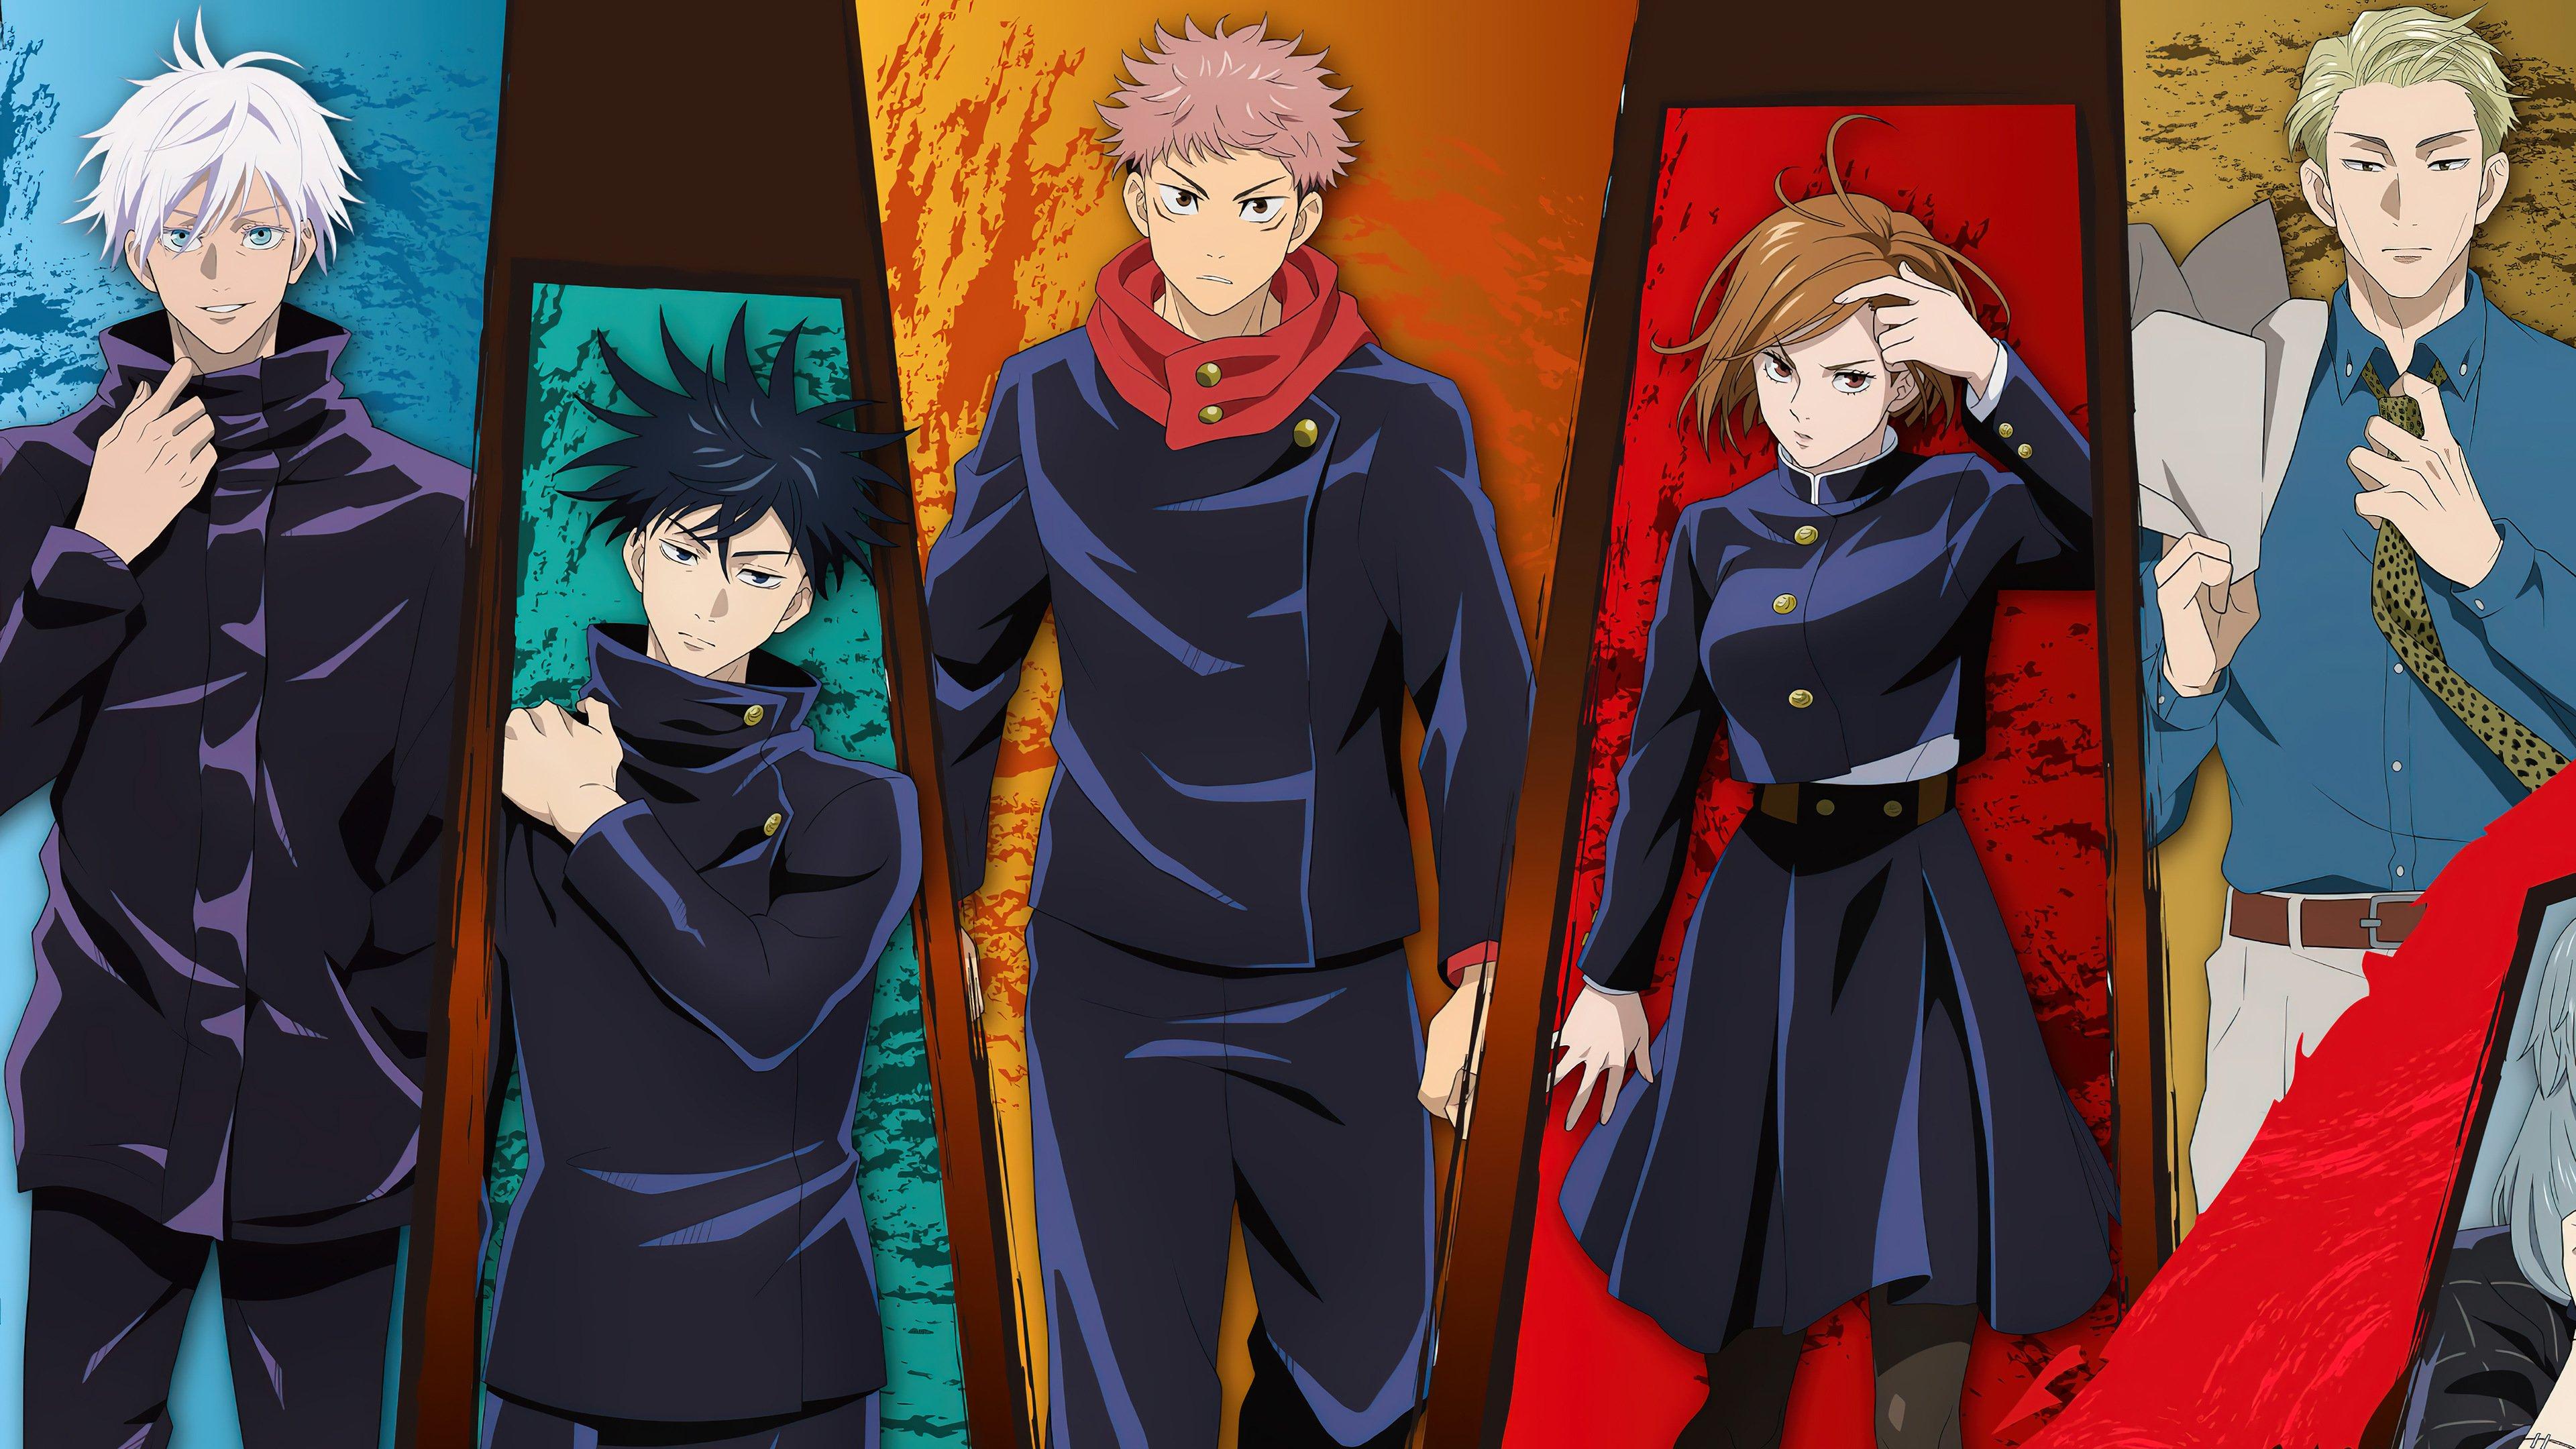 Anime Wallpaper Characters from Jujutsu Kaisen